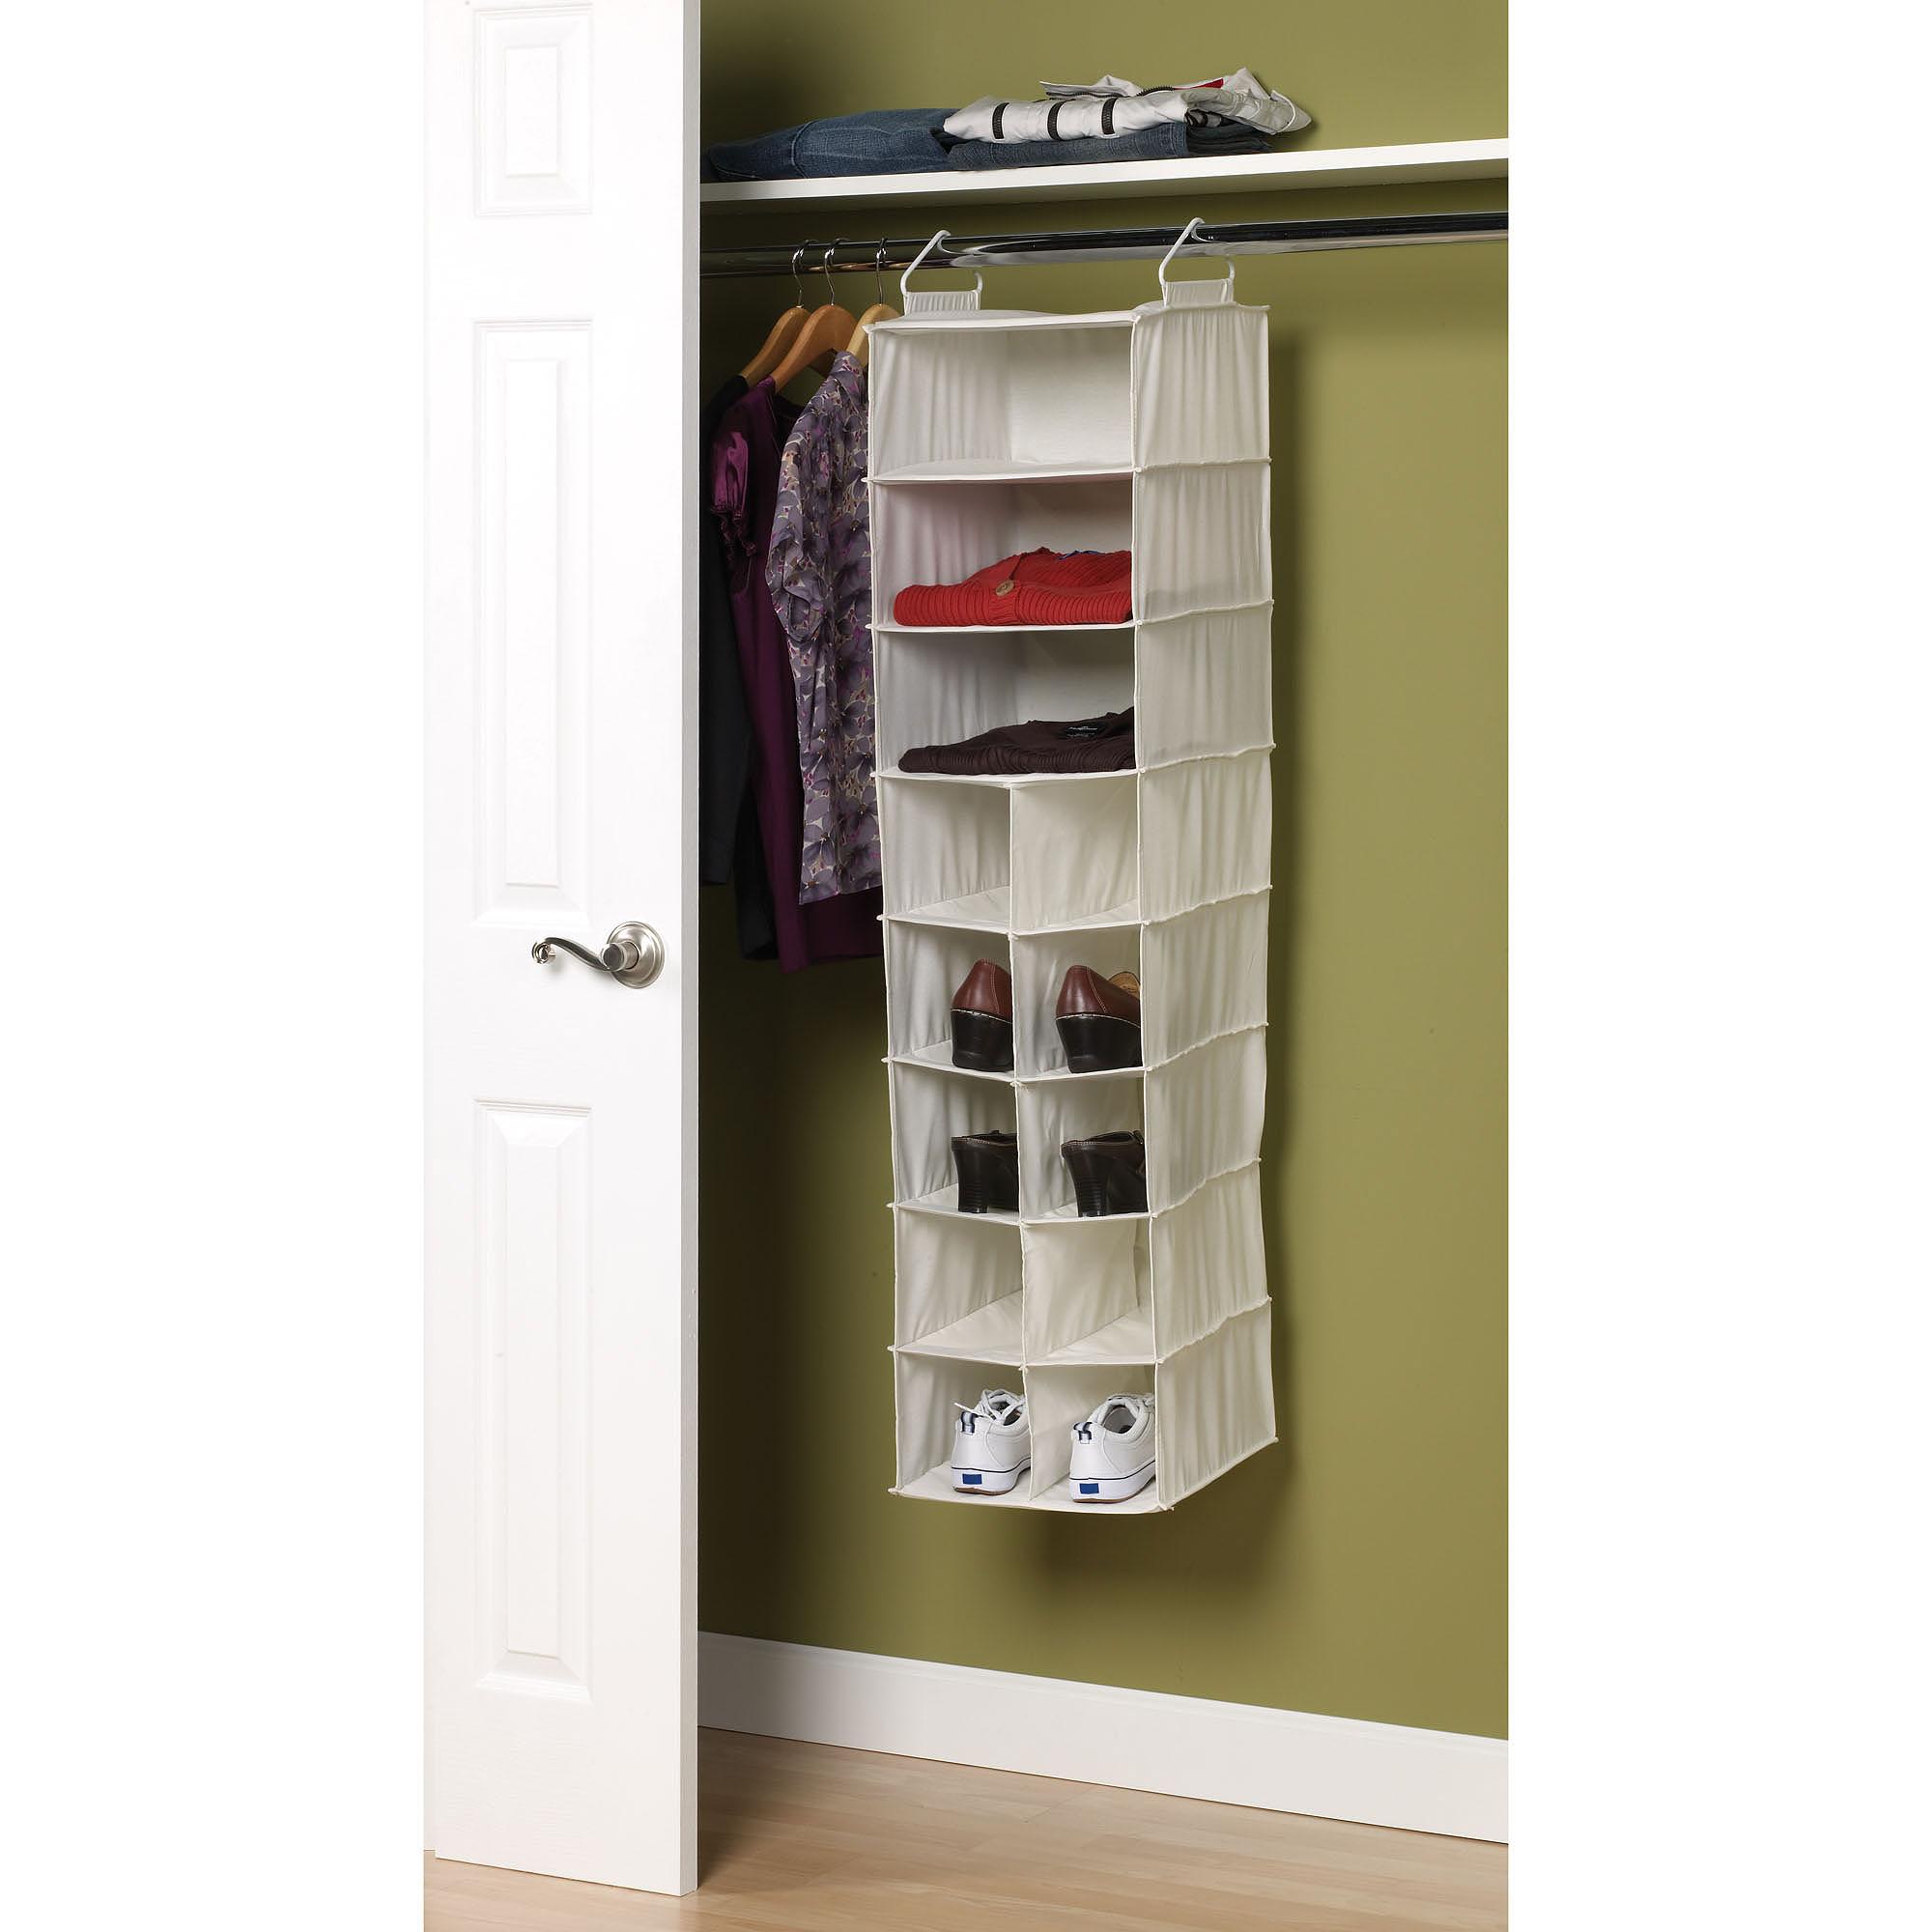 Household Essentials Natural Blended Canvas 10-Pocket/3-Shelf Organizer